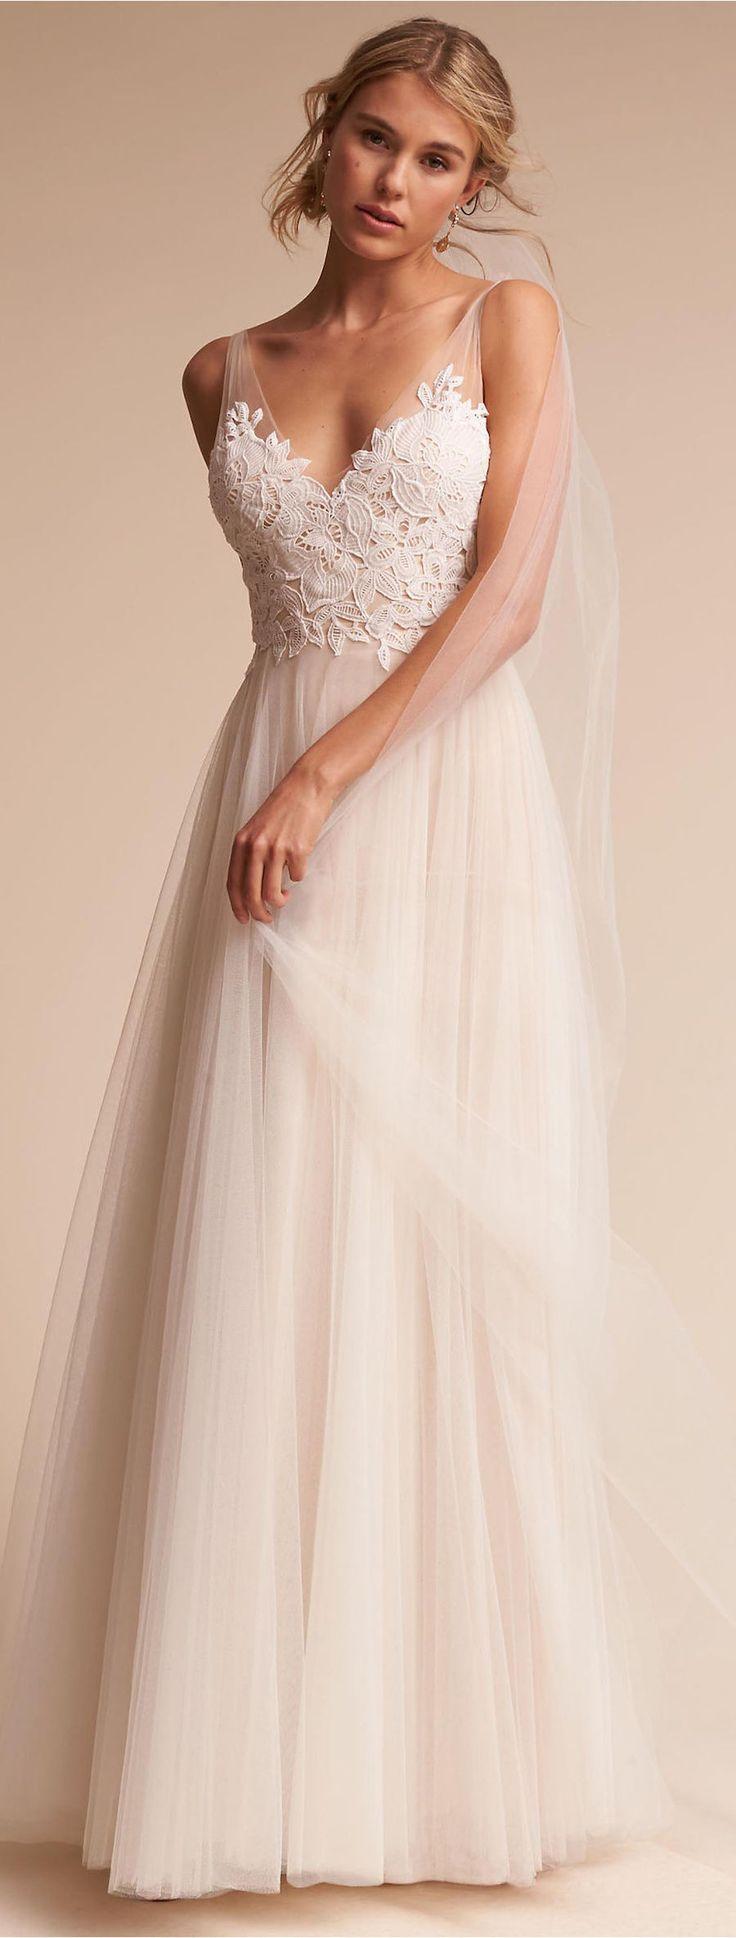 Affordable Wedding dress